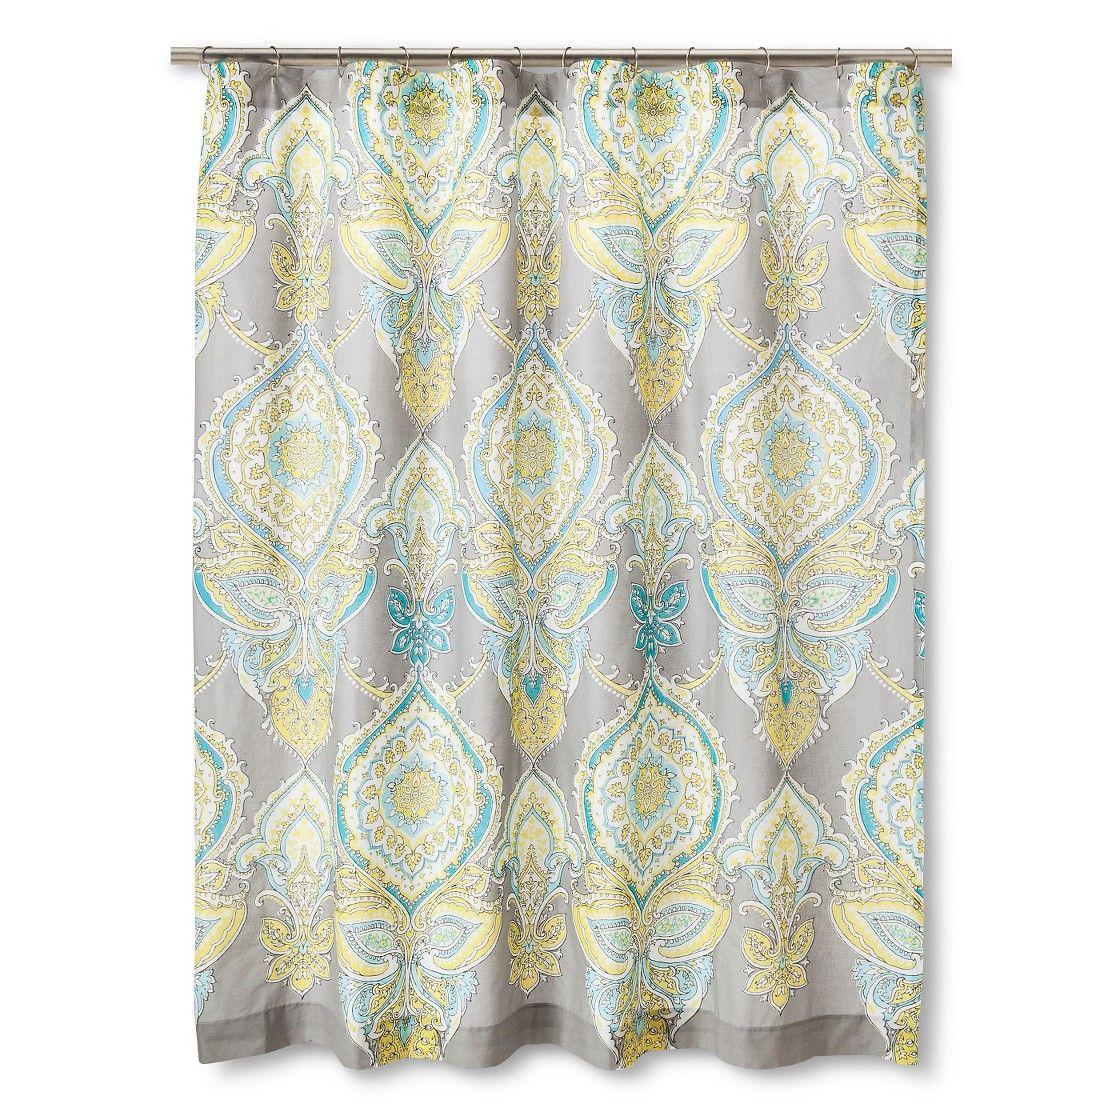 Aqua chevron shower curtain - Anila Shower Curtain Gray Aqua Yellow Mudhut